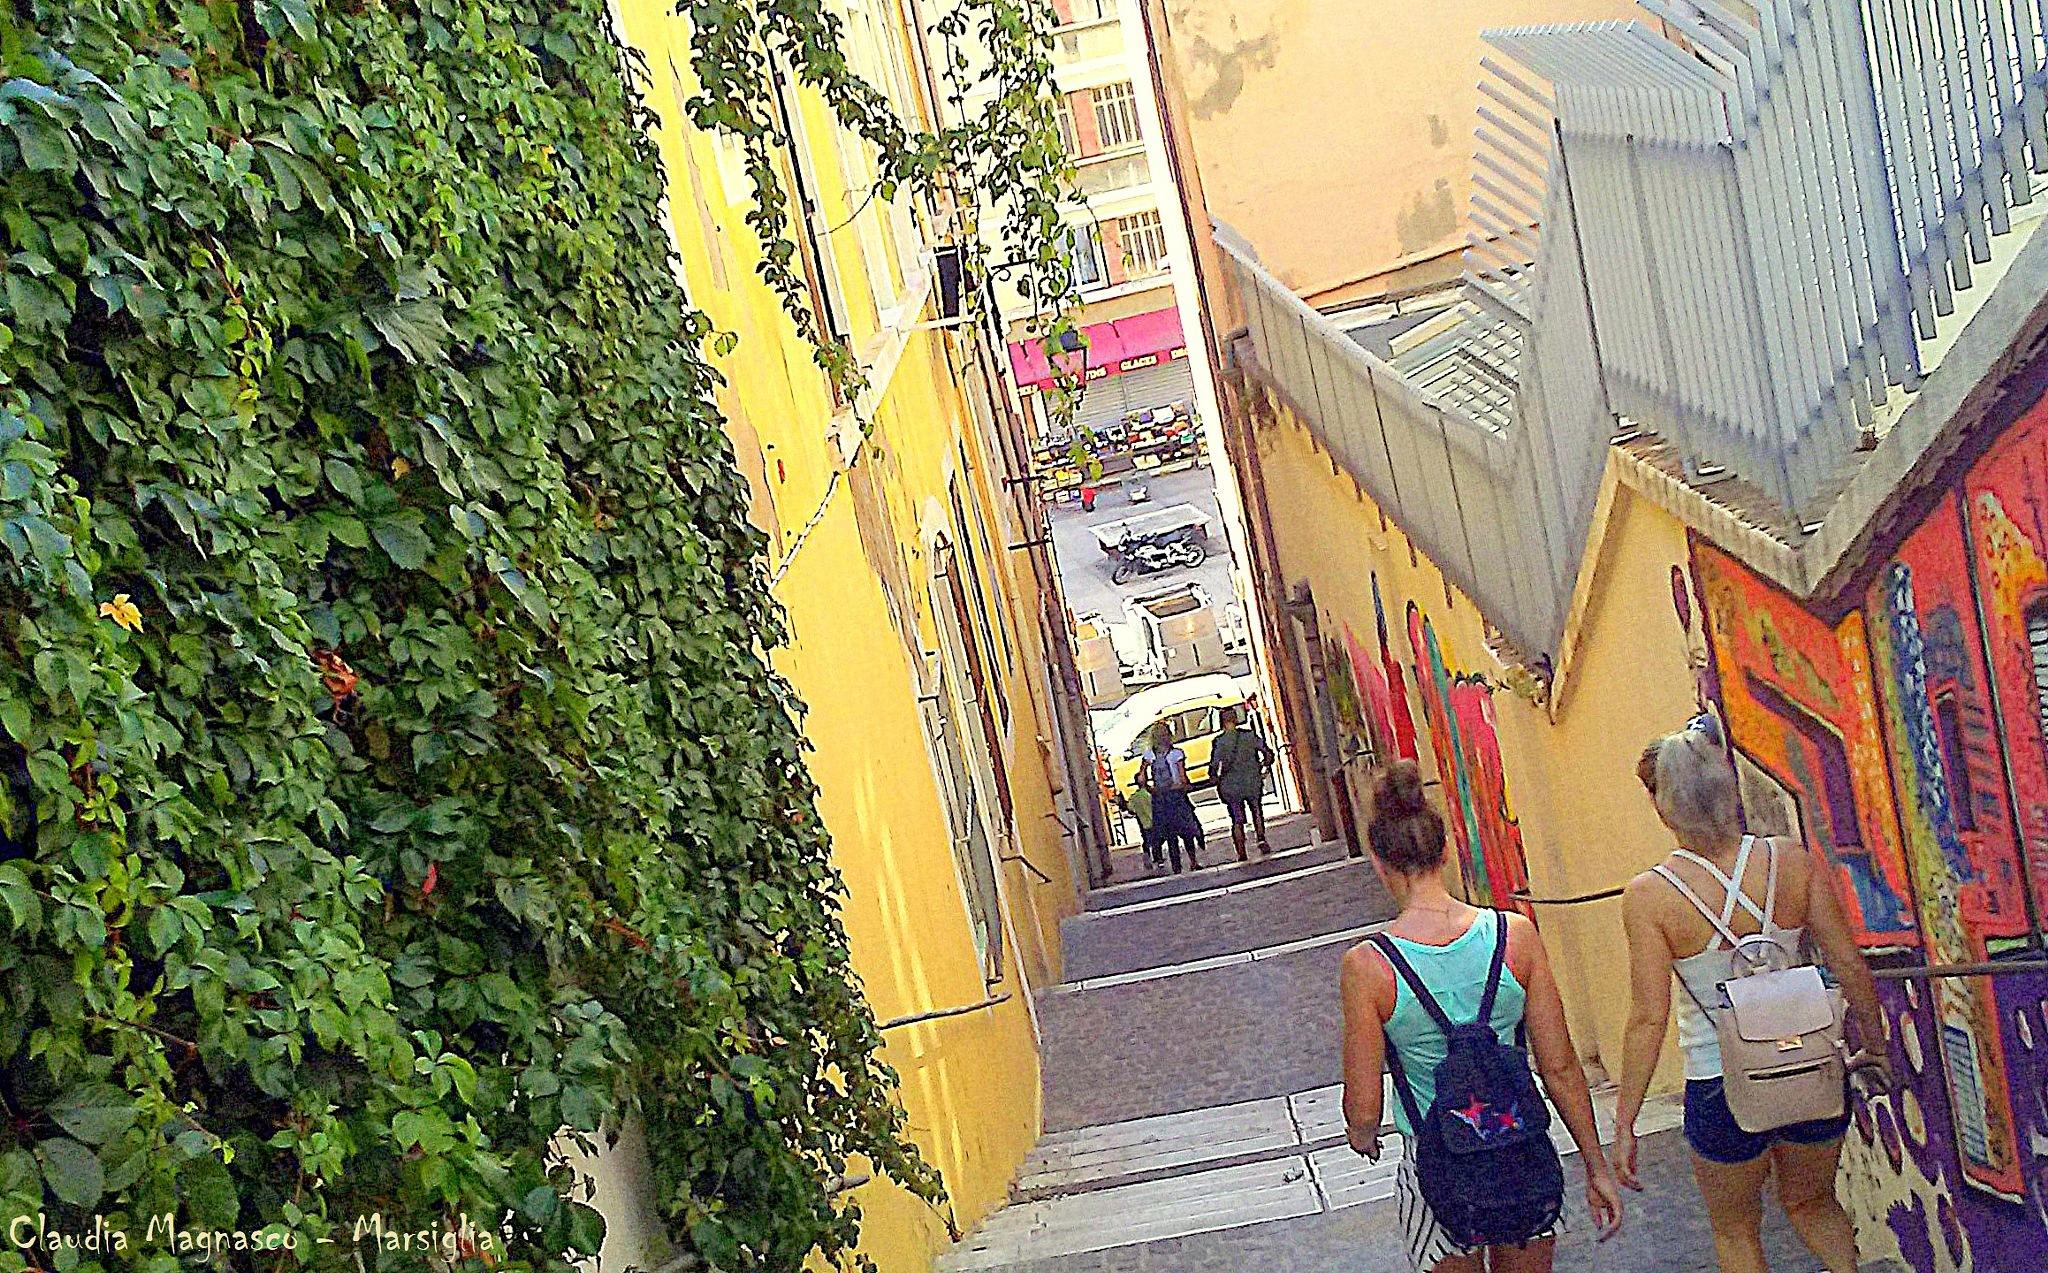 Going down in Marsiglia by claudiamagnasco